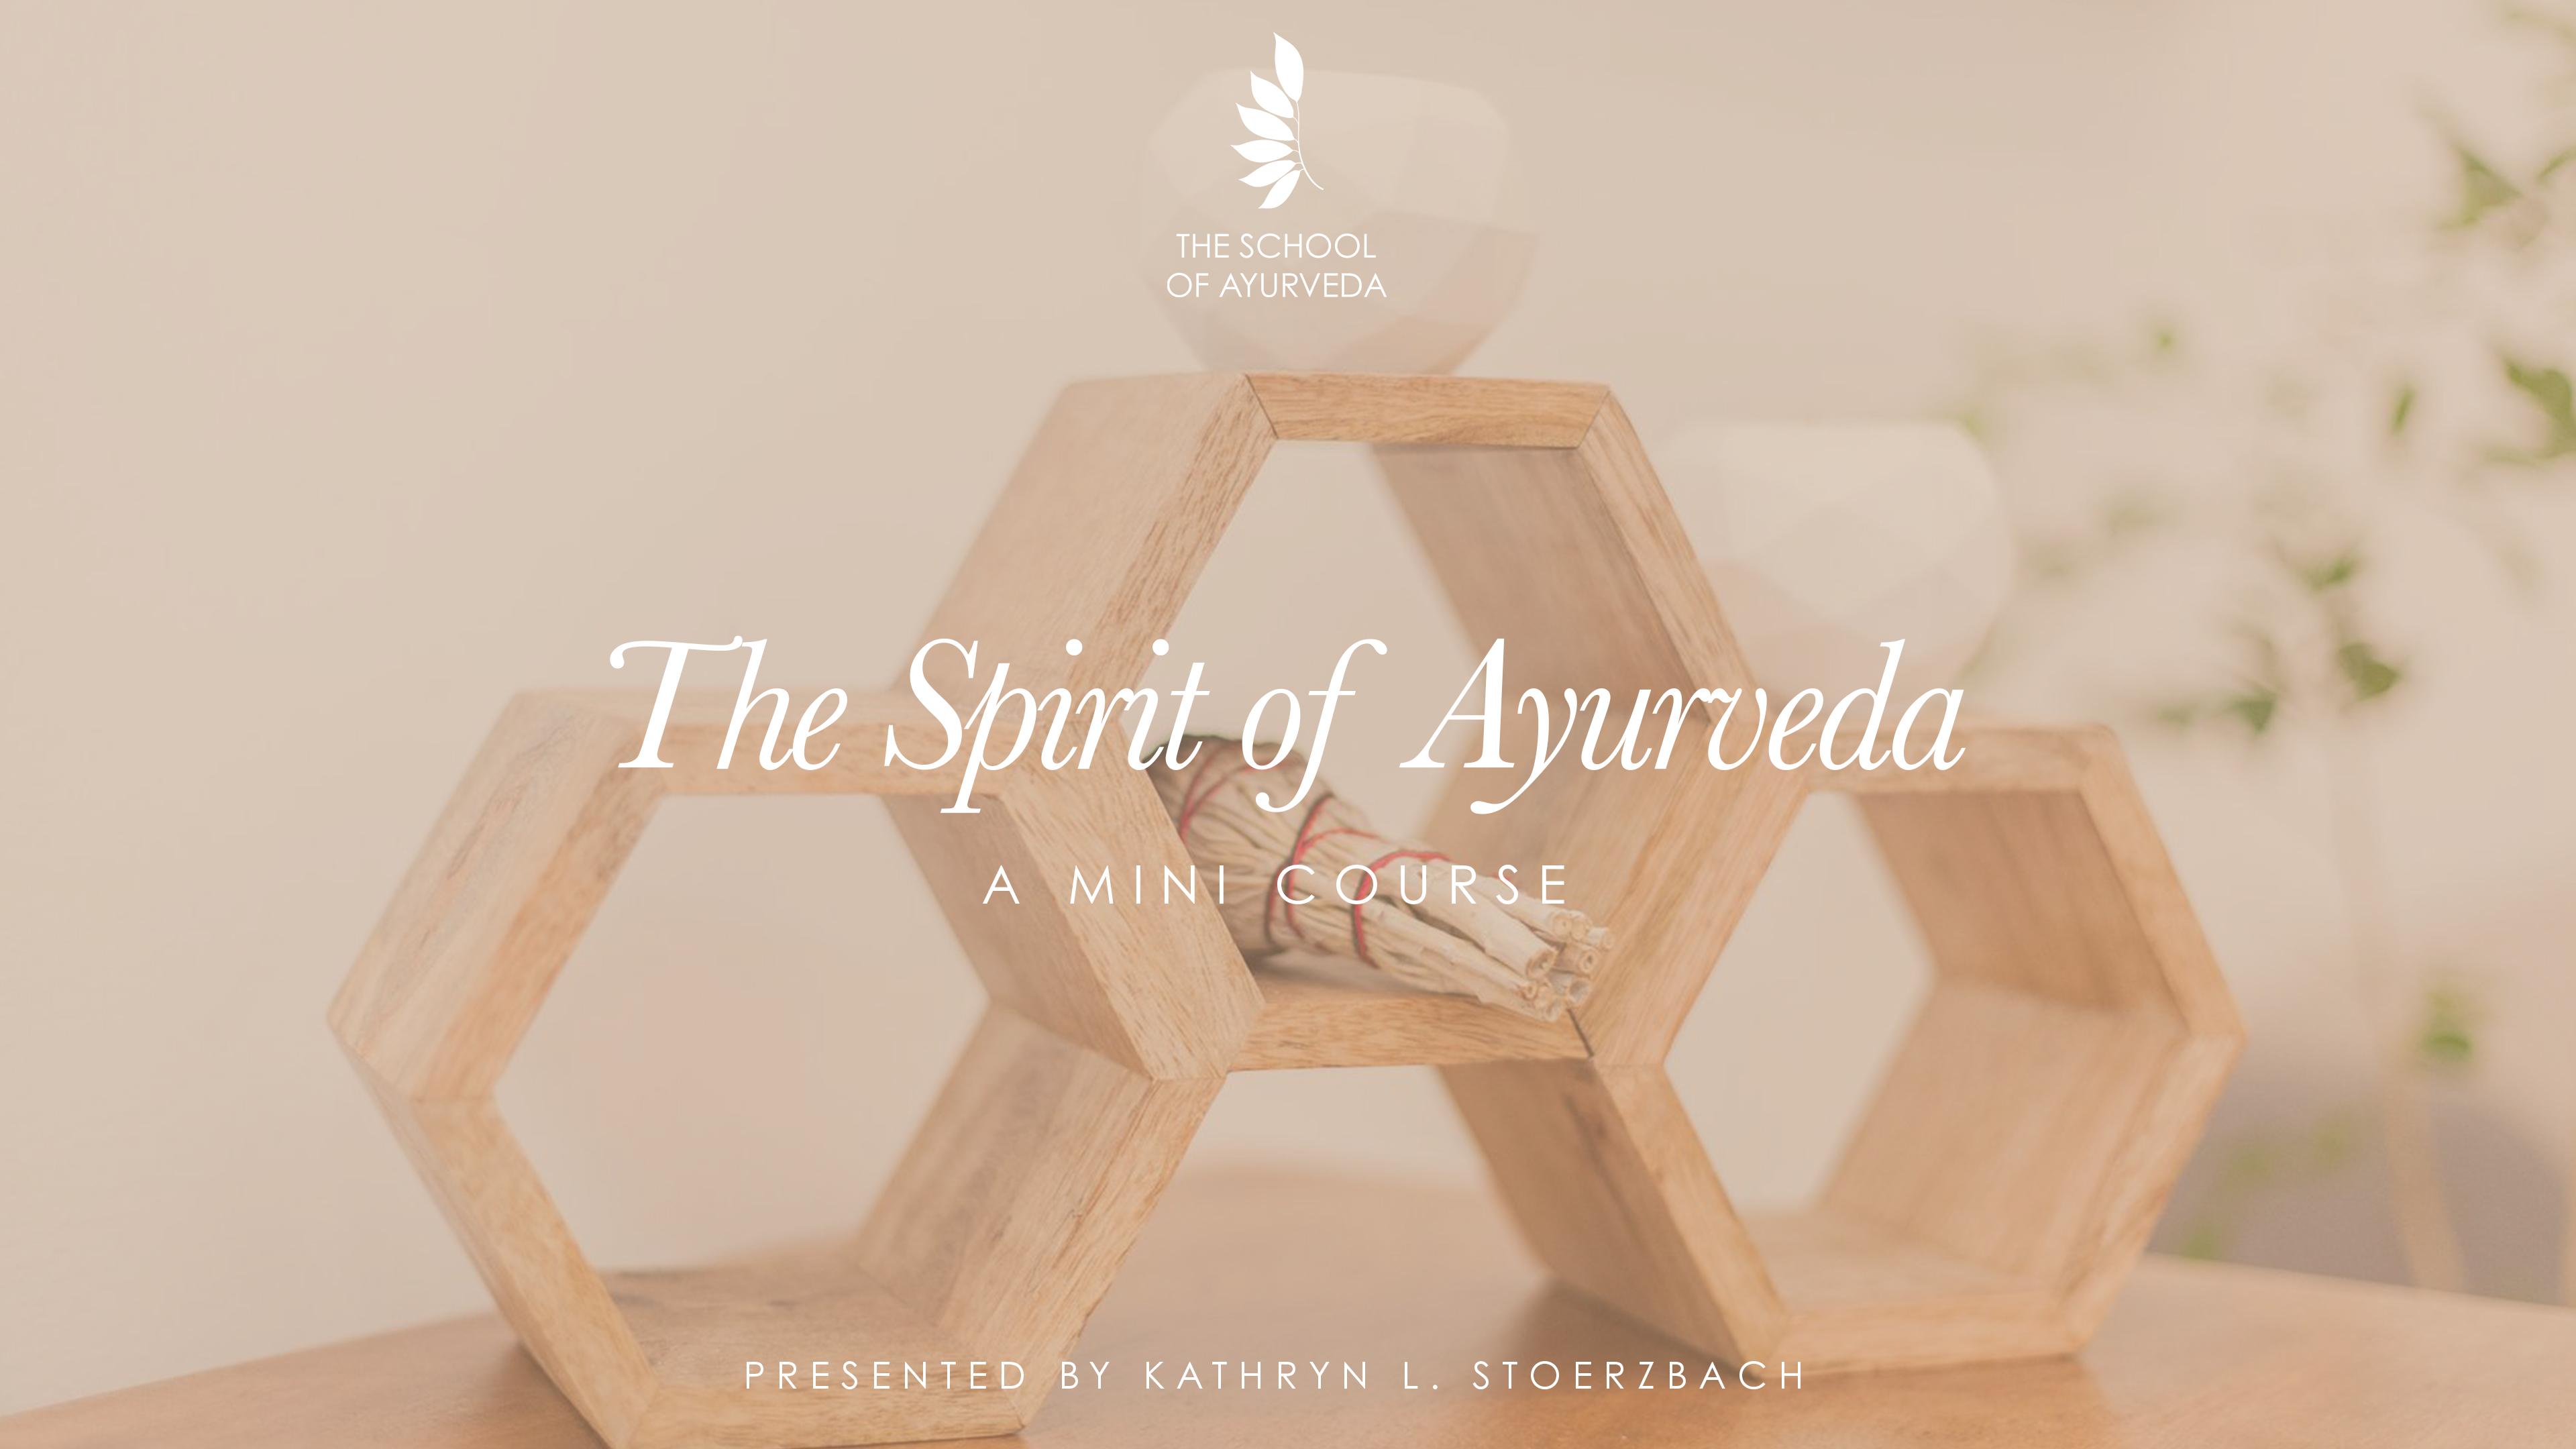 The Spirit of Ayurveda Mini Course.